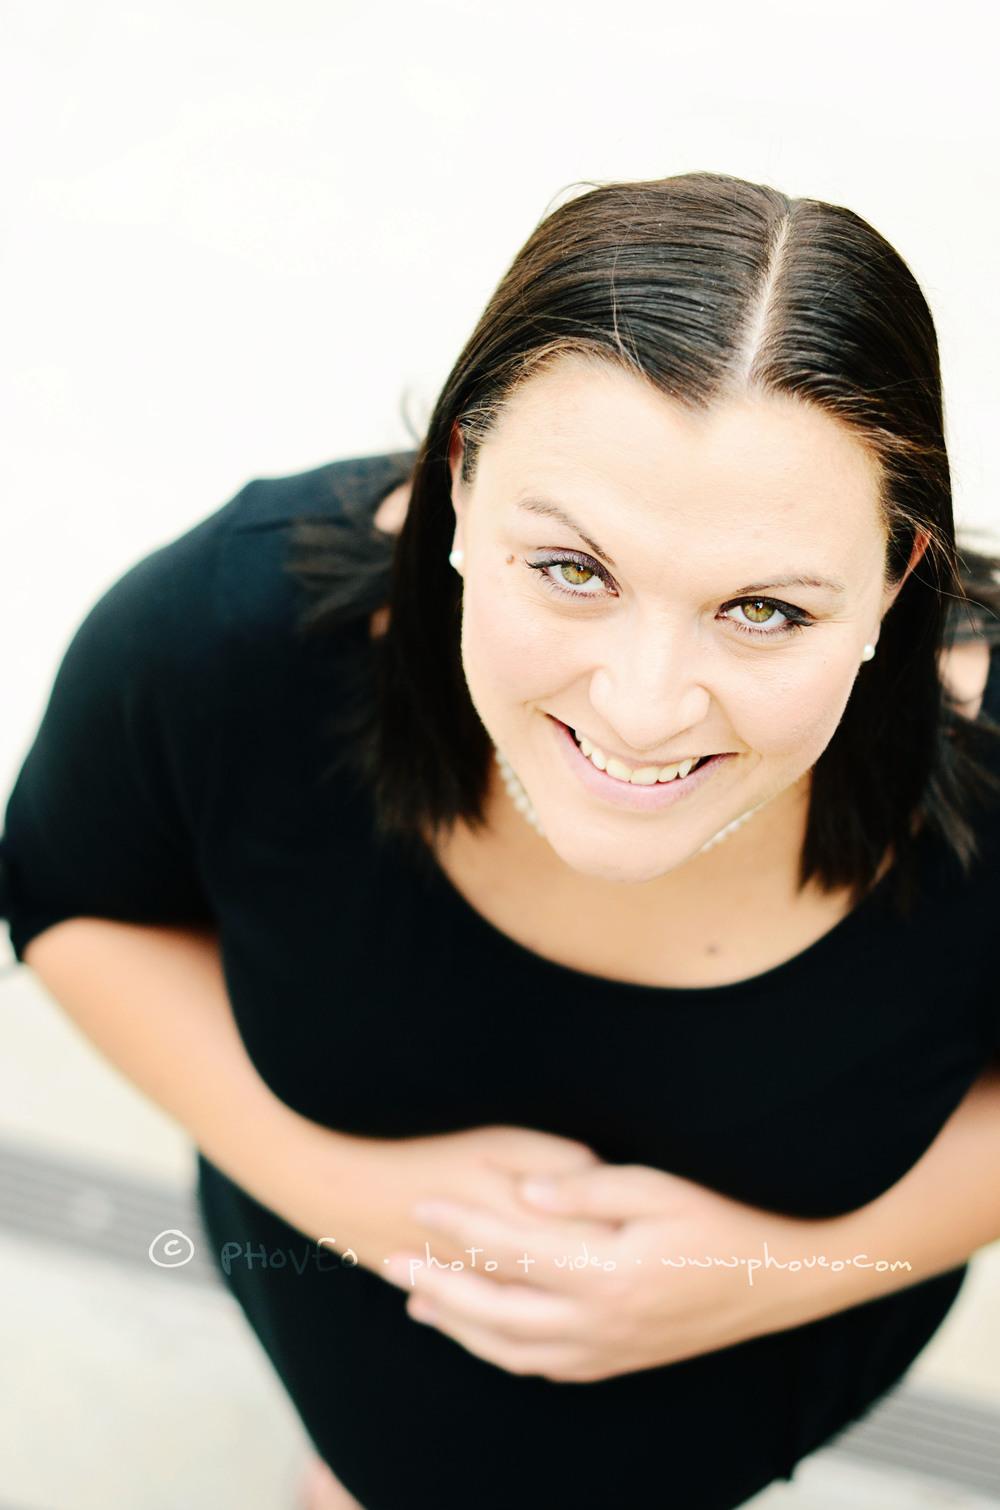 WM_Amy10.jpg